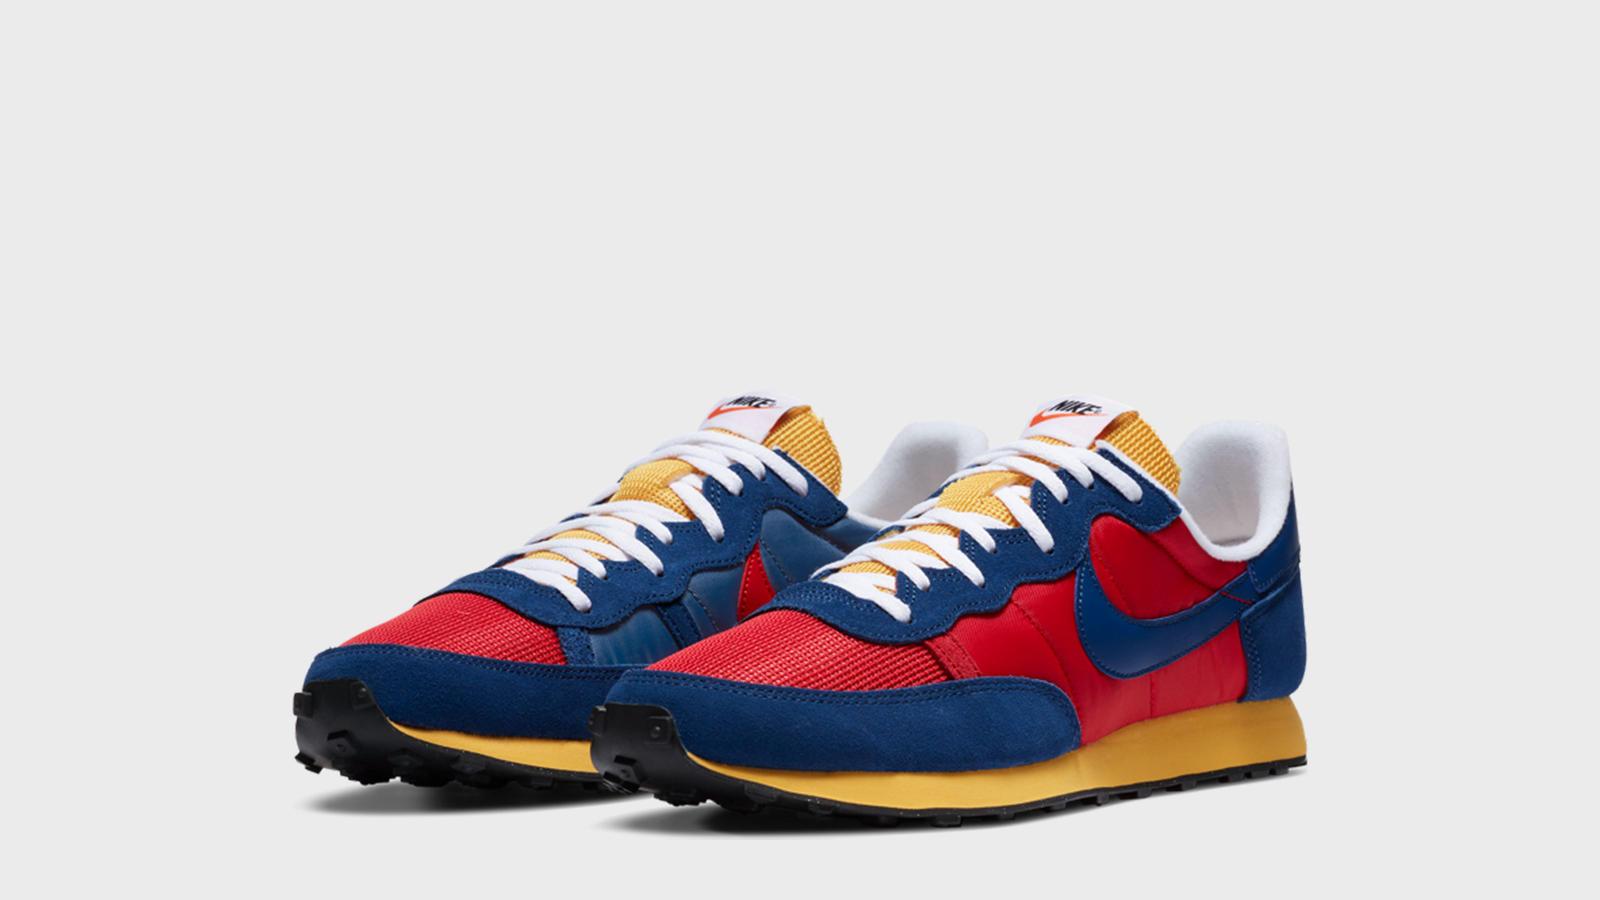 Nike Challenger 2020 7